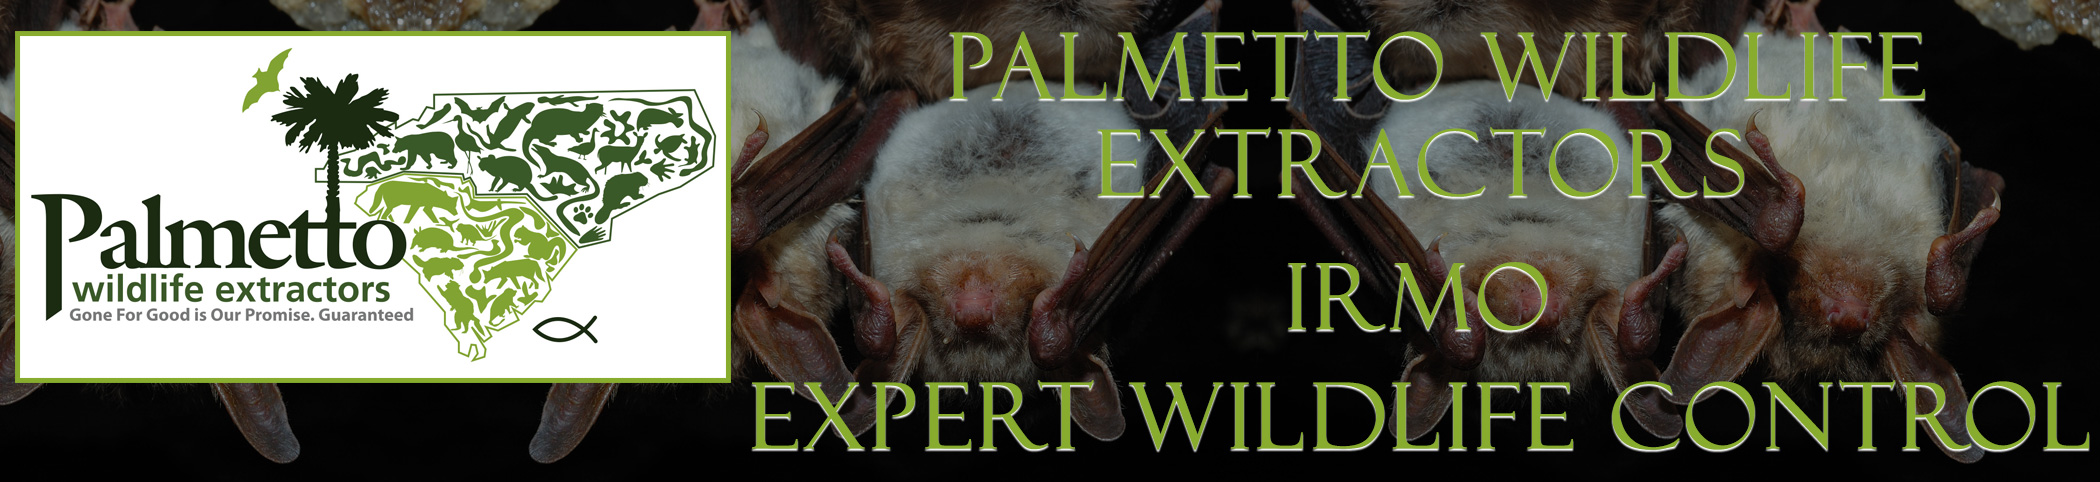 Palmetto Wildlife Extractors Irmo South Carolina header image